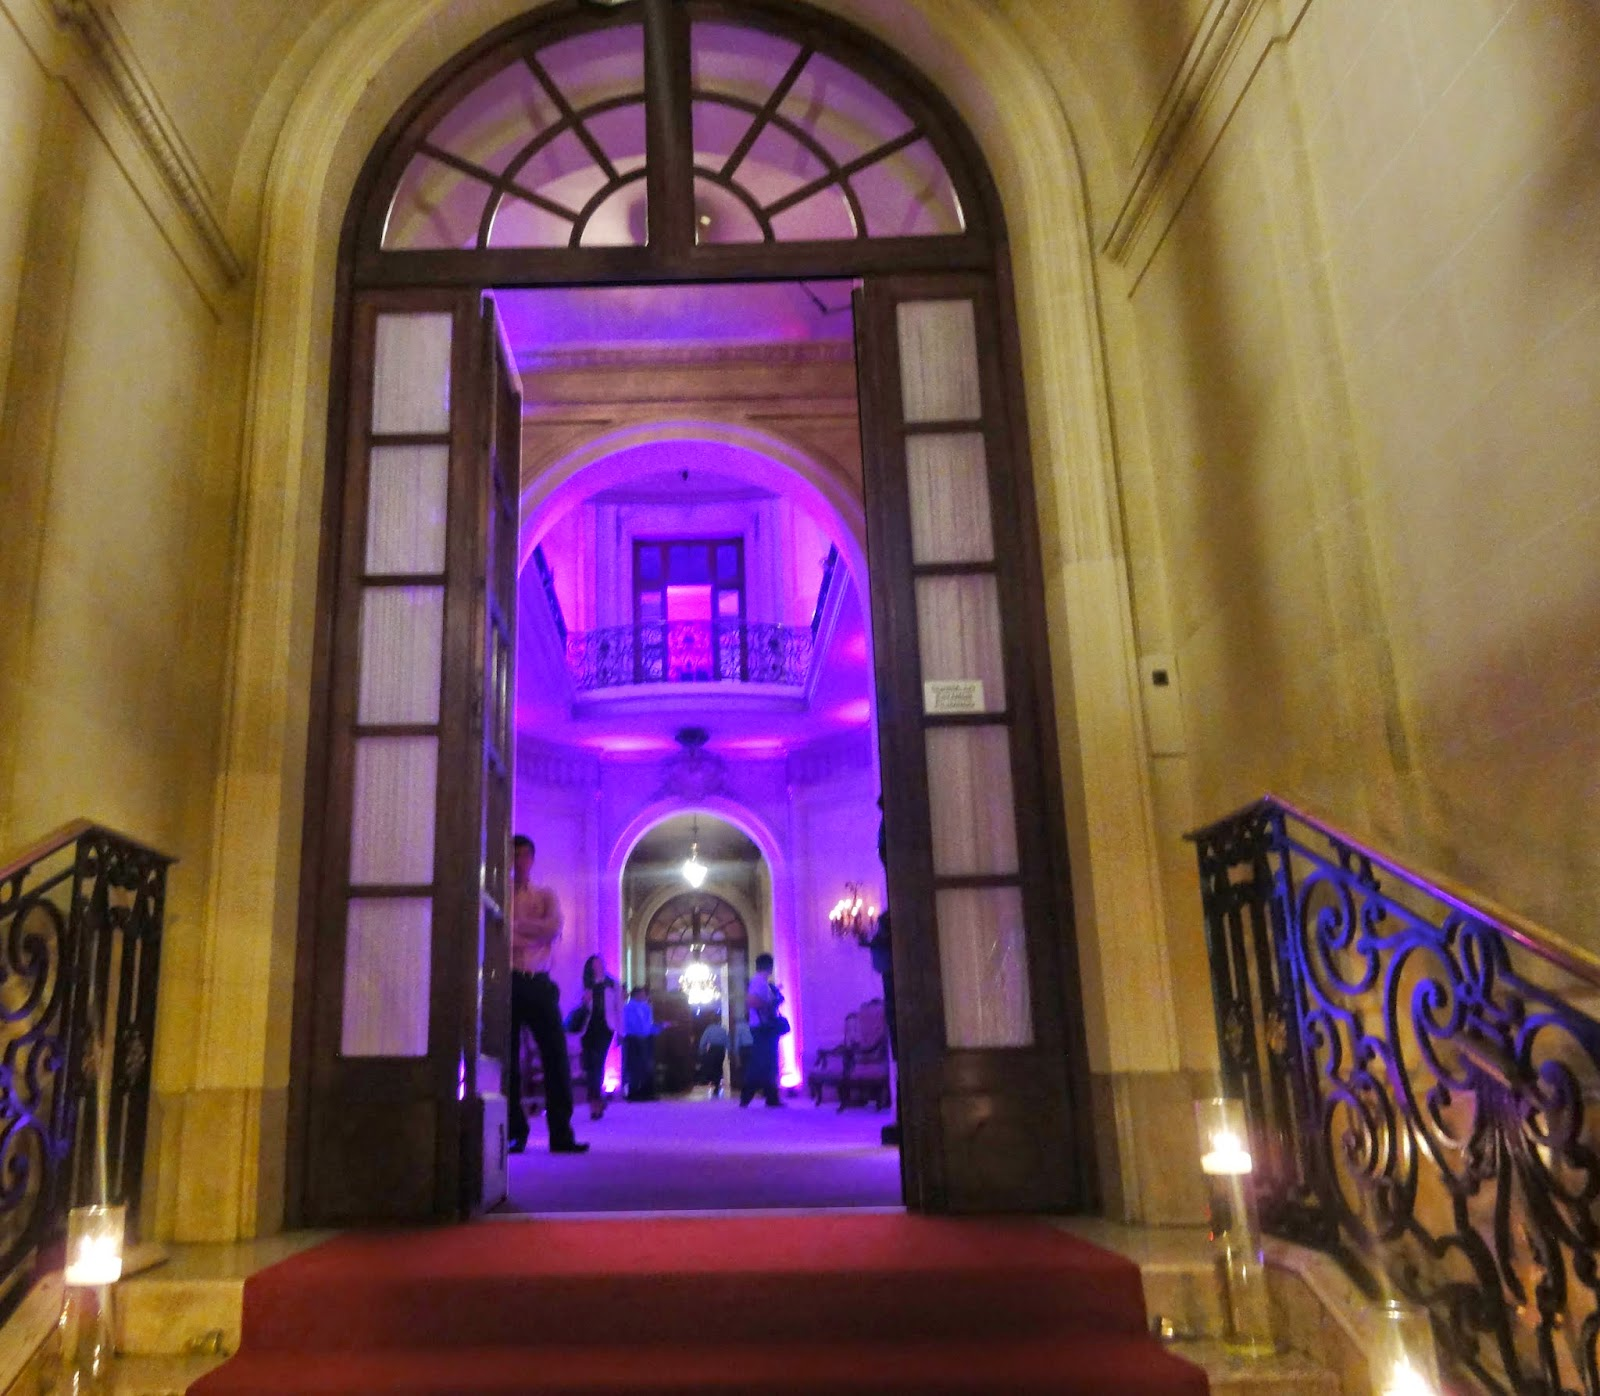 http://videosarq.blogspot.com.ar/2014/04/el-palacio-bencich-100-anos-reabre-sus.html